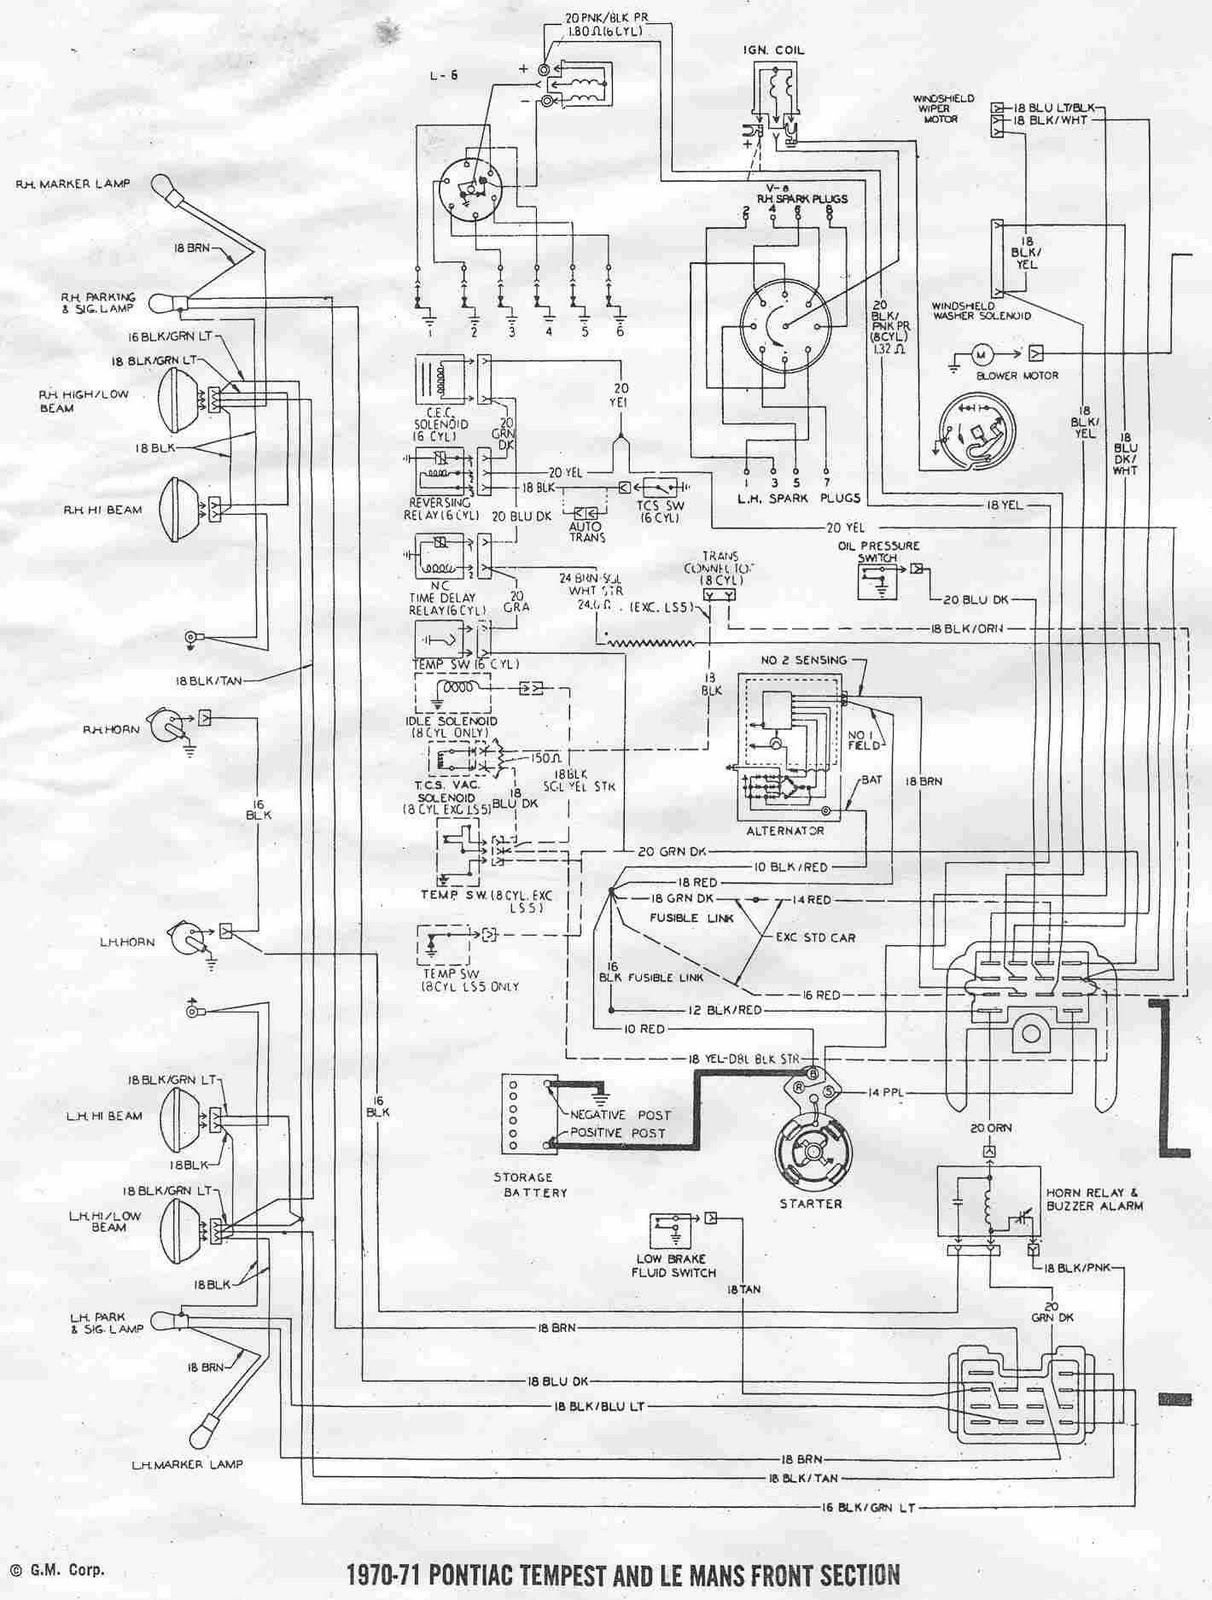 hight resolution of 67 gto light wiring diagram 18 1 stromoeko de u202266 gto wiring diagram wiring diagram